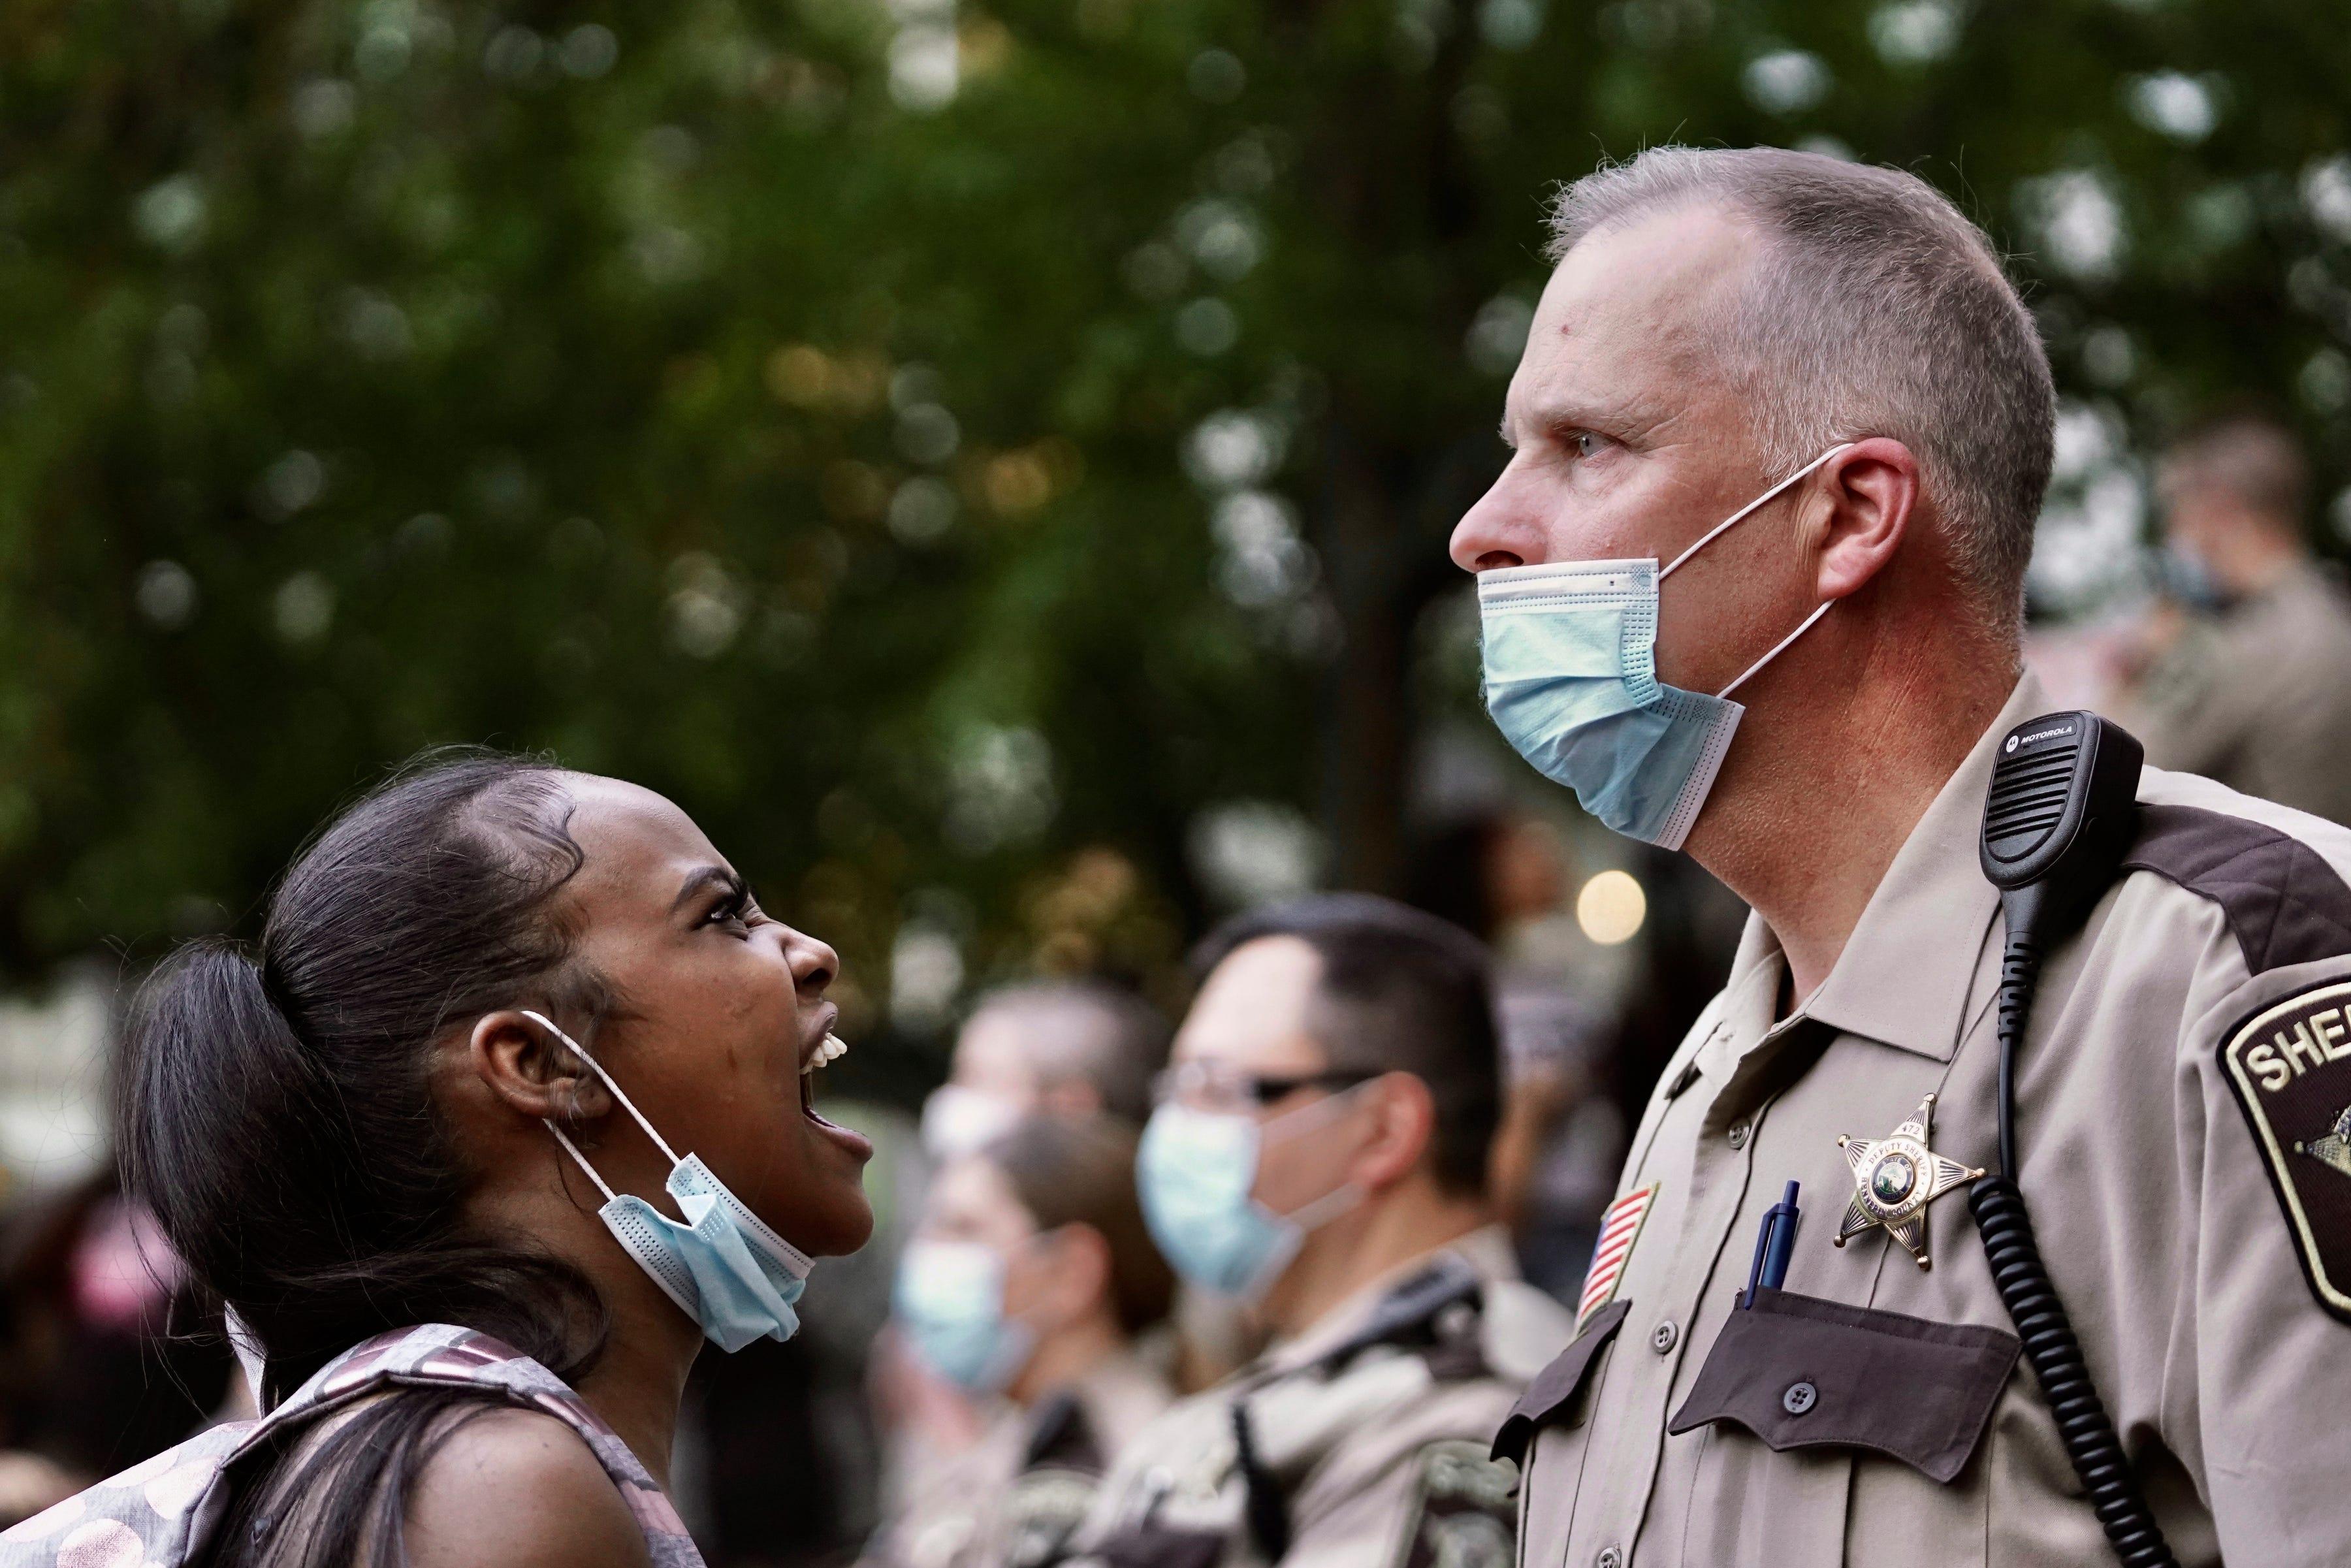 https://www.gannett-cdn.com/presto/2020/05/30/USAT/e6bbe41a-59ae-4823-88fb-b17167ce13e7-AP_APTOPIX_Minneapolis_Police_Death.jpg